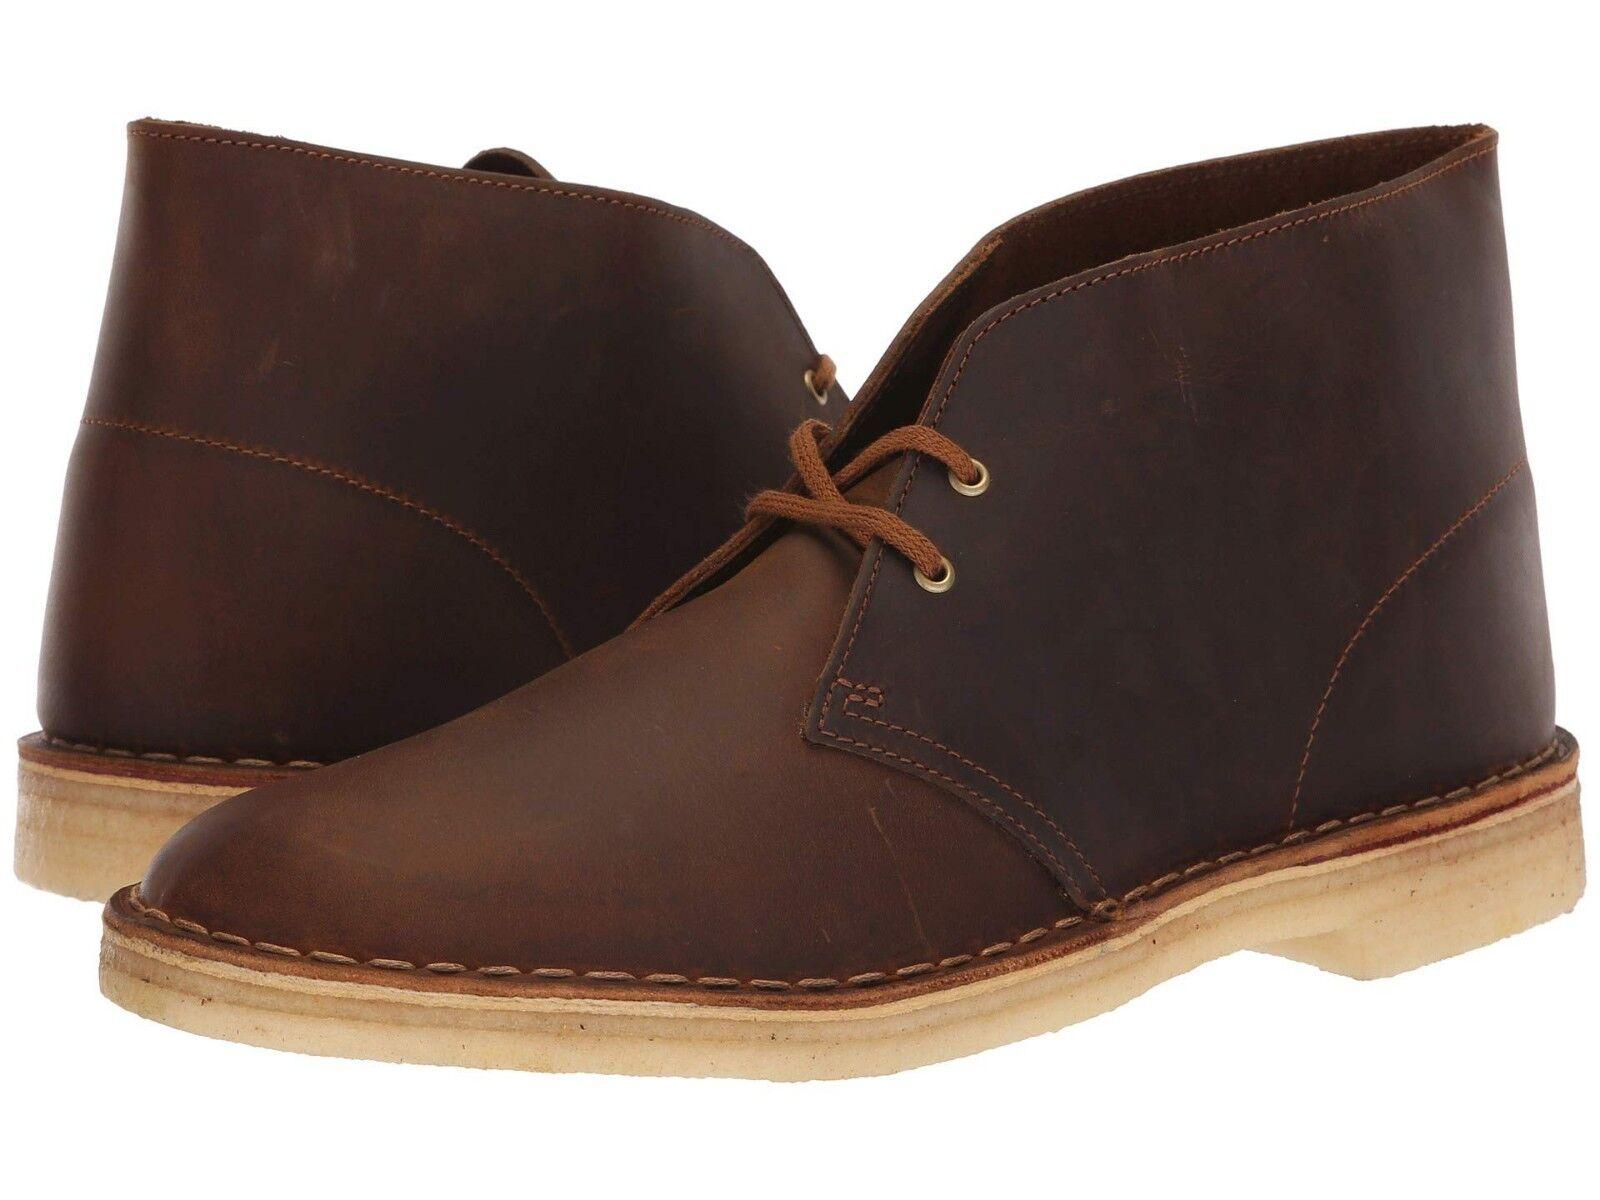 Men's Shoes Clarks Originals DESERT BOOT Leather Chukkas 26138221 BEESWAX